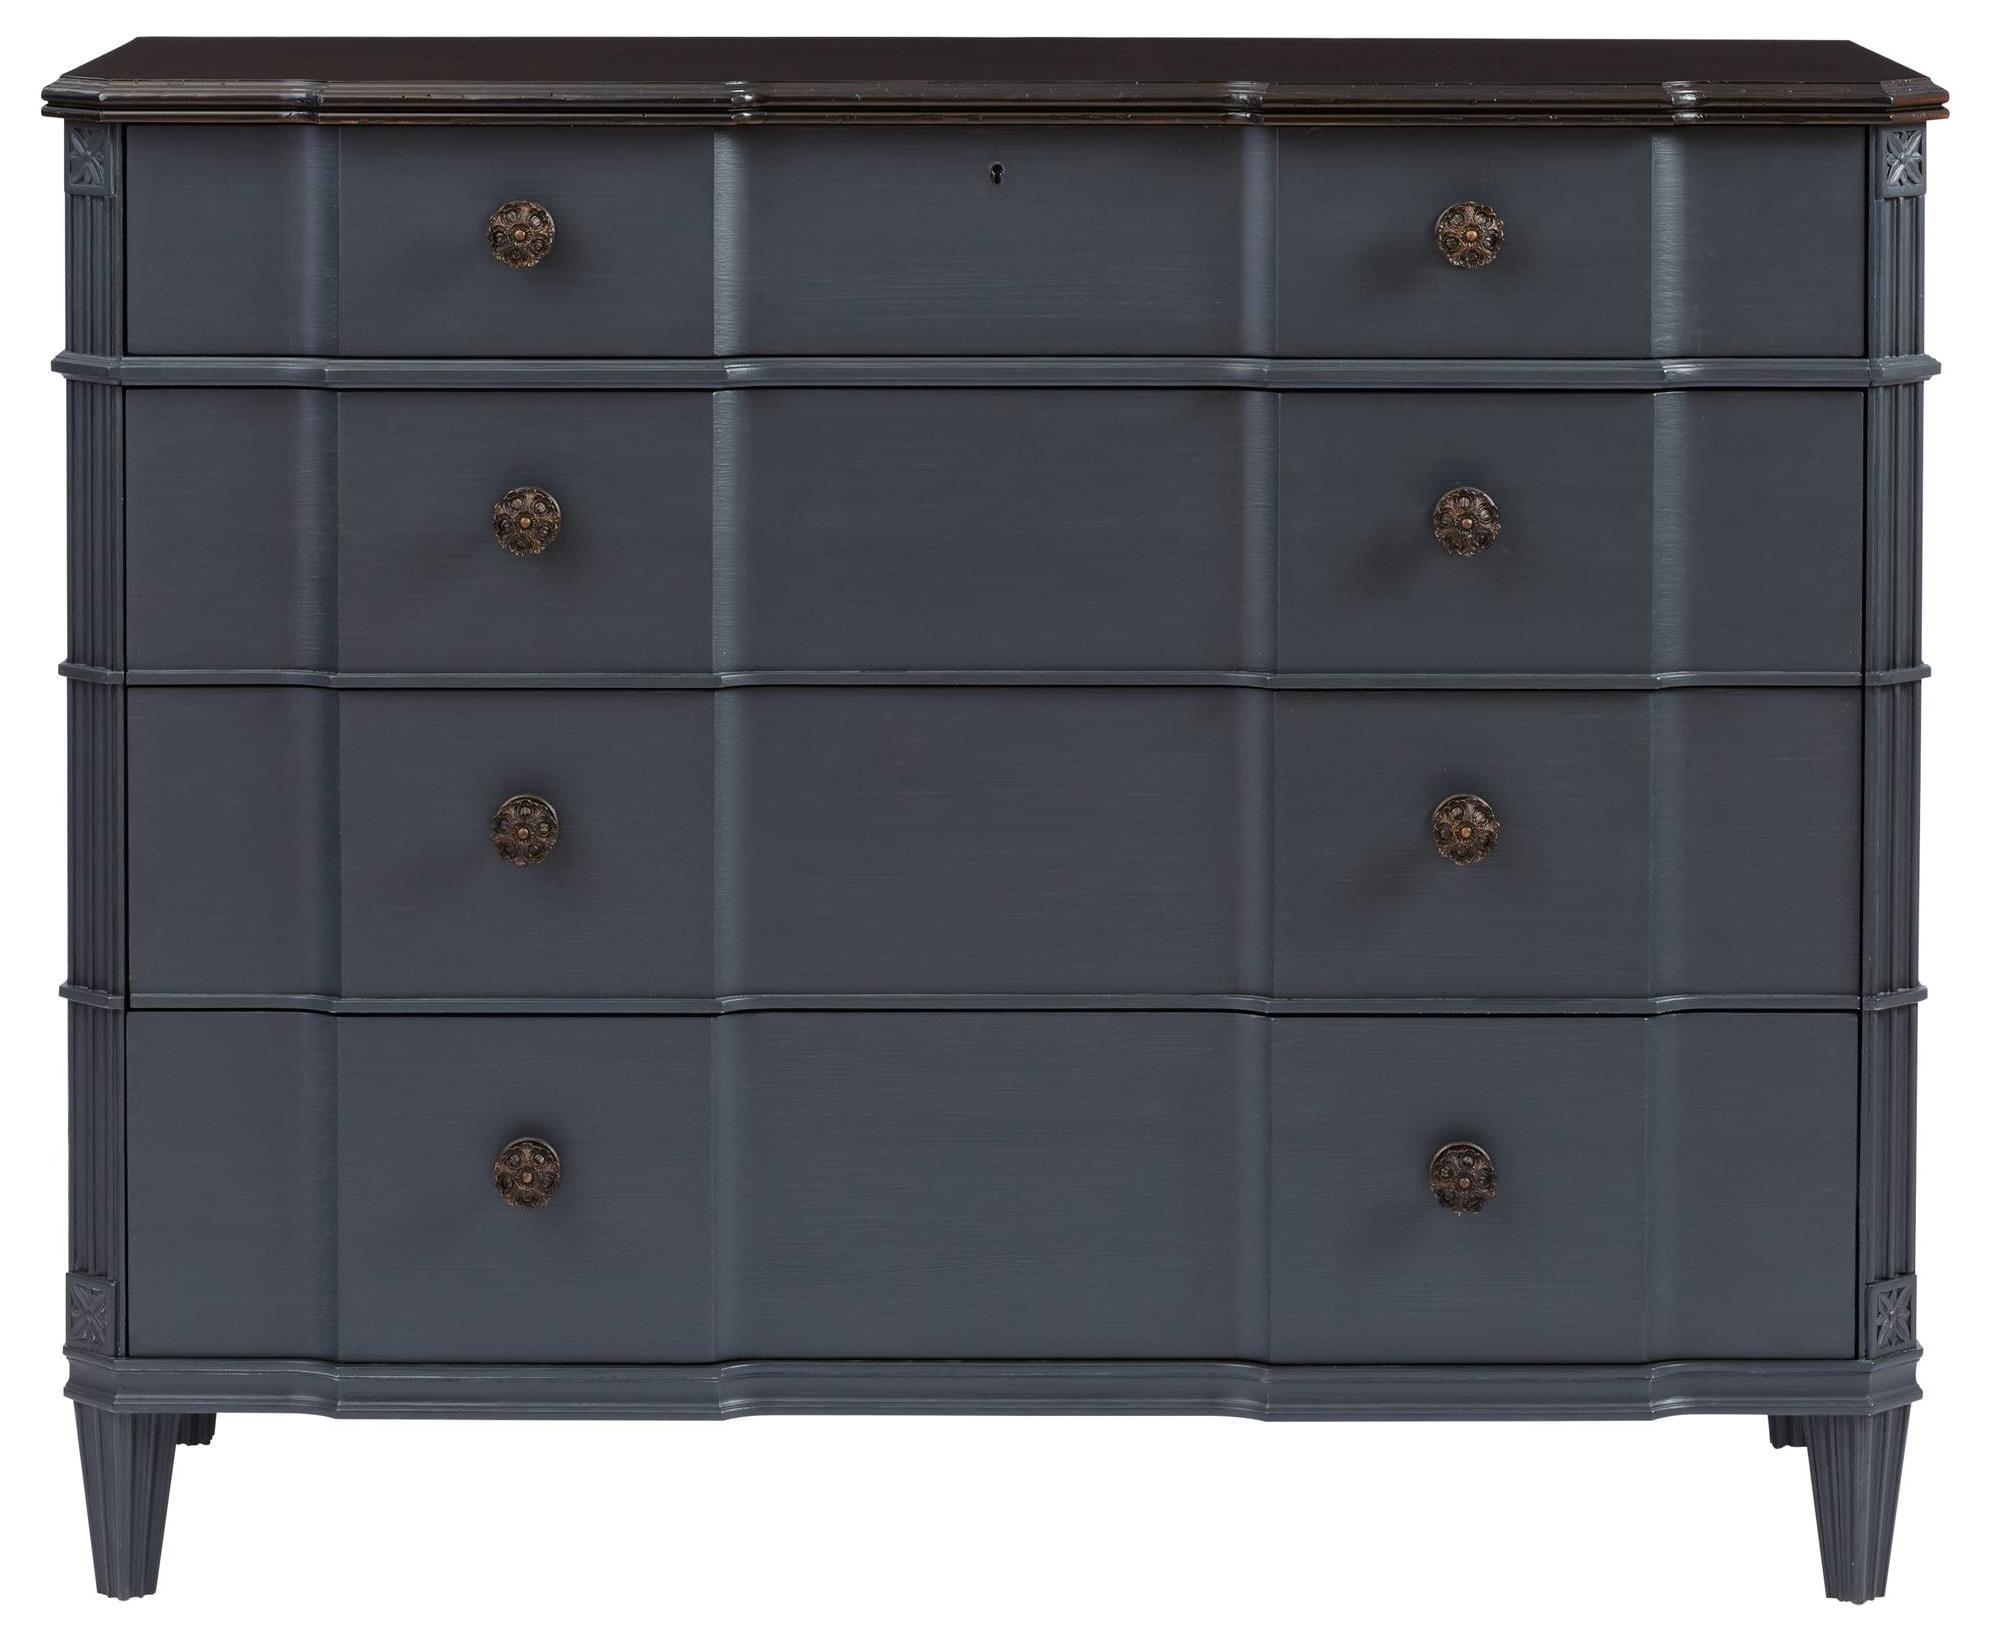 Stanley Furniture Villa Couture Claudia Single Dresser - Item Number: 510-83-04